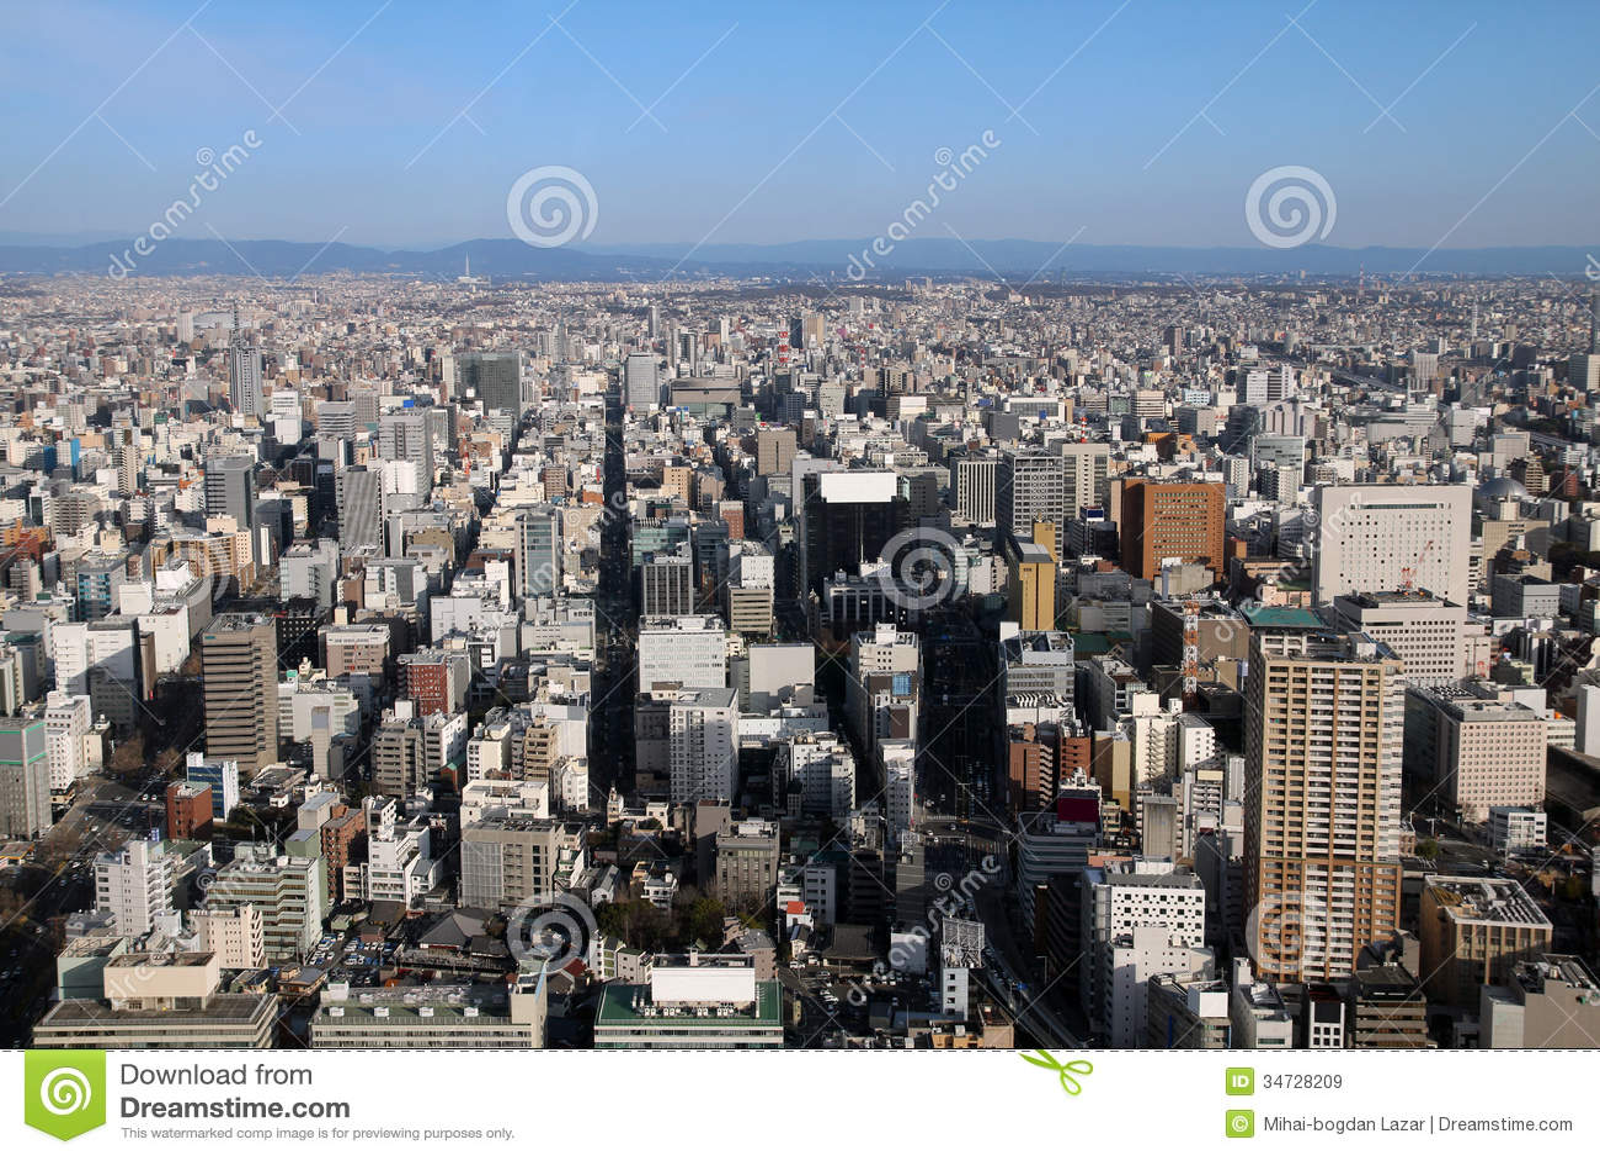 Nagoya aerial, Japan